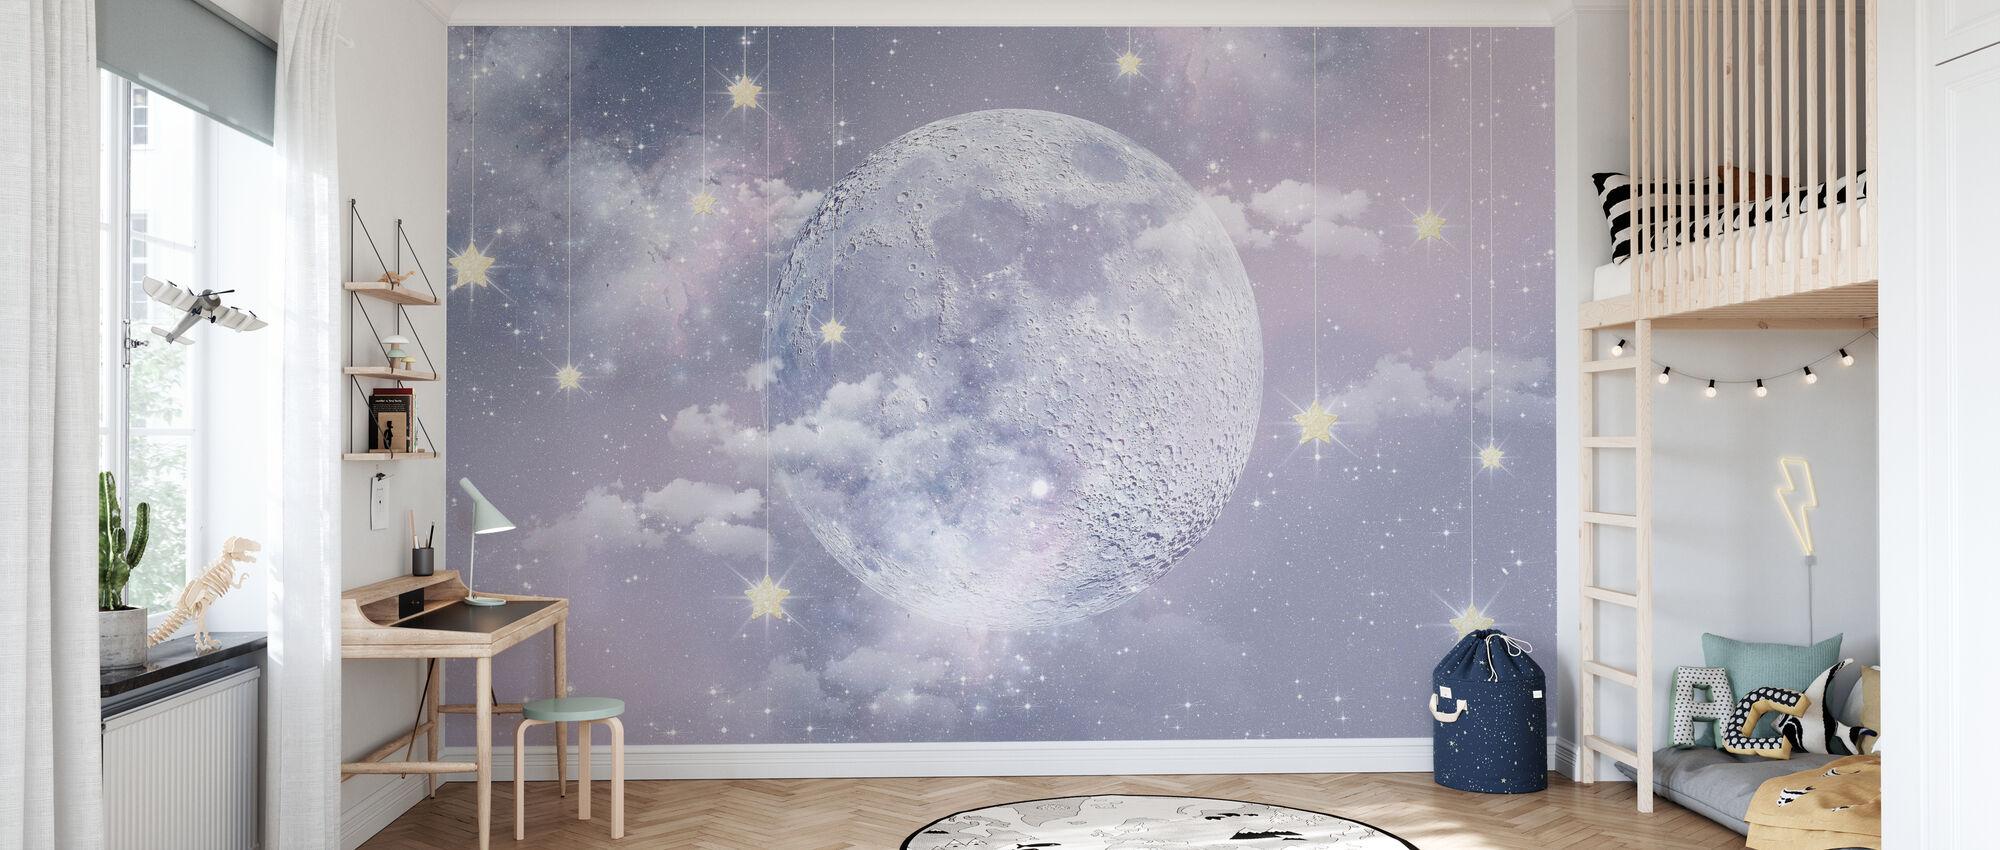 Moon with stars - Wallpaper - Kids Room